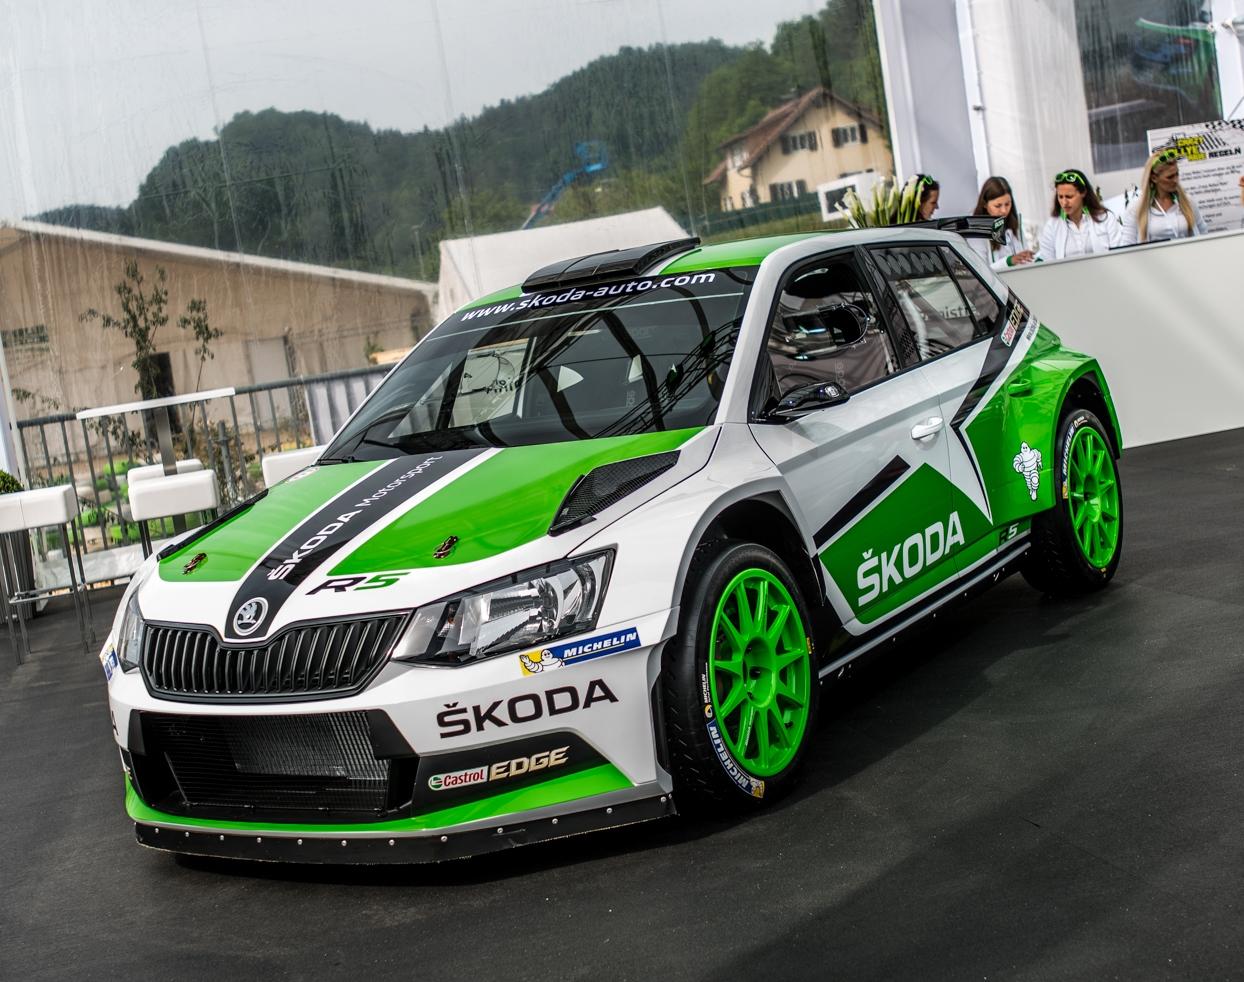 Skoda Octavia Rs >> Sporty, sporty: Five ŠKODA greats at Wörthersee GTI ...